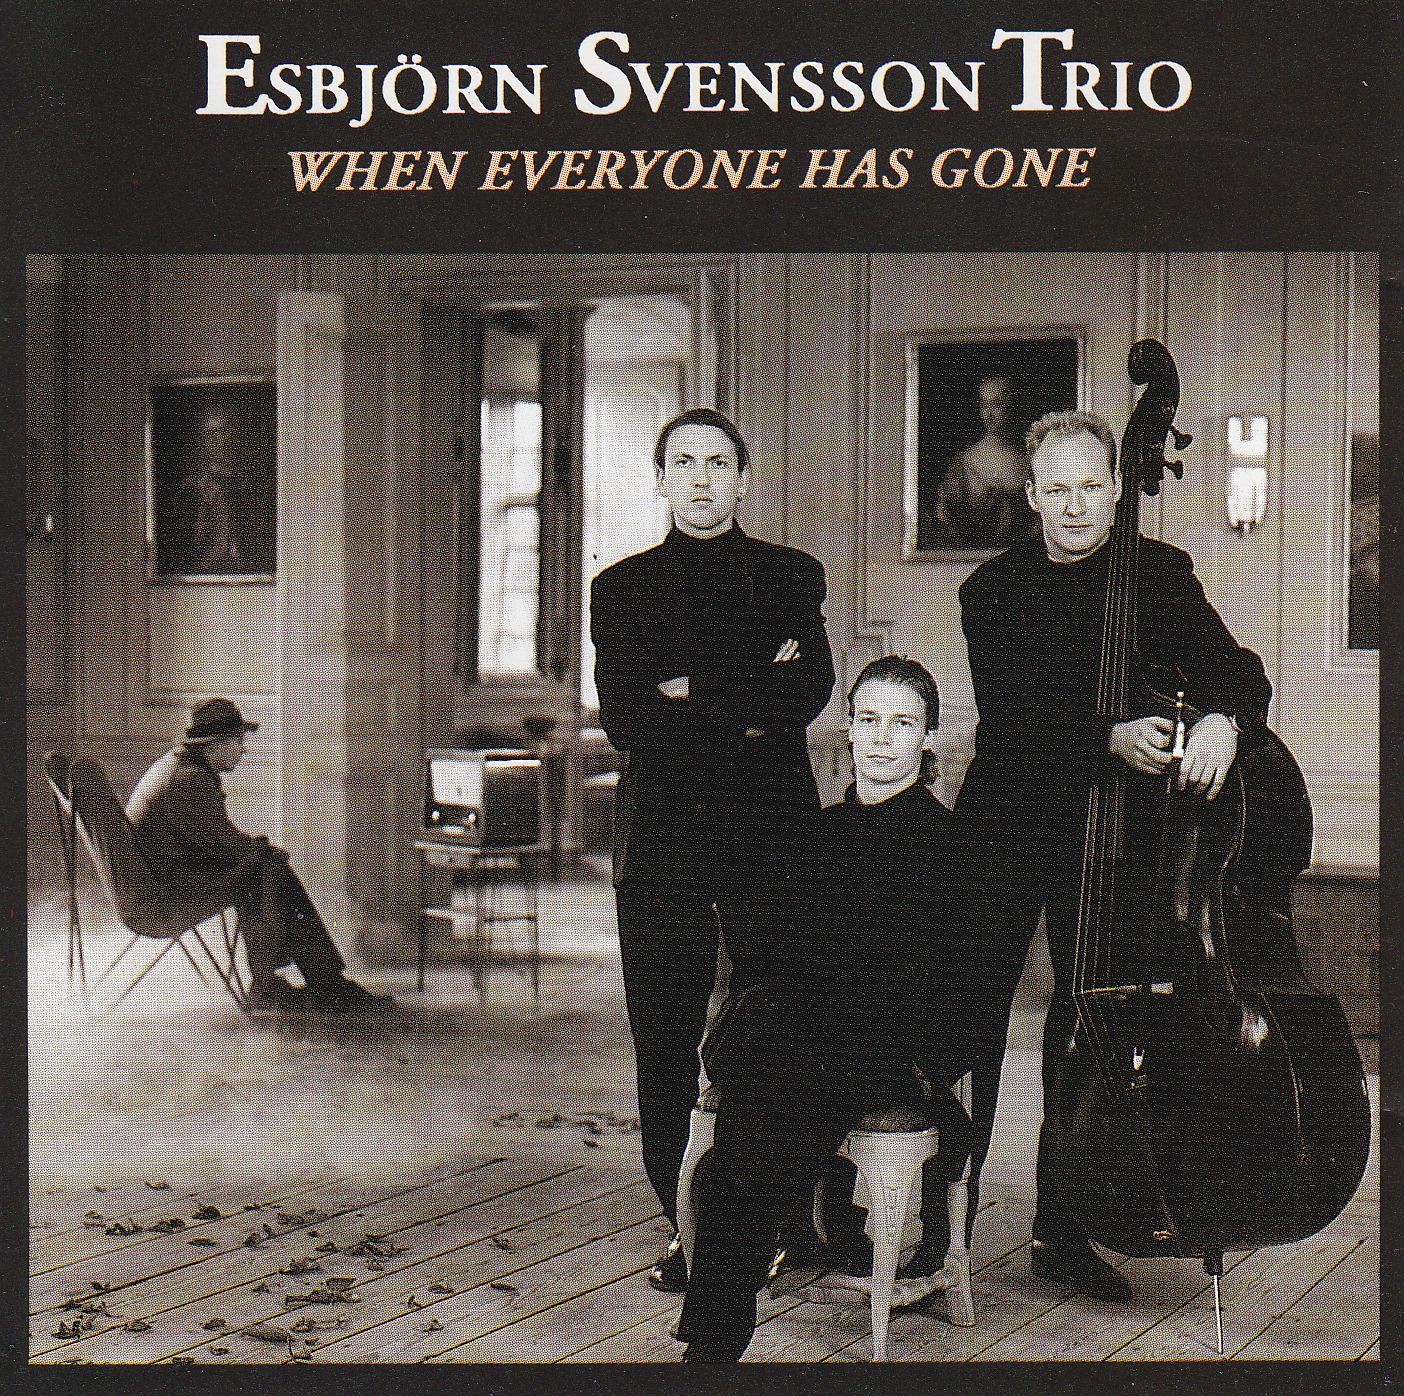 E.S.T.* Esbjörn Svensson Trio - Esbjörn Svensson Trio Plays Monk